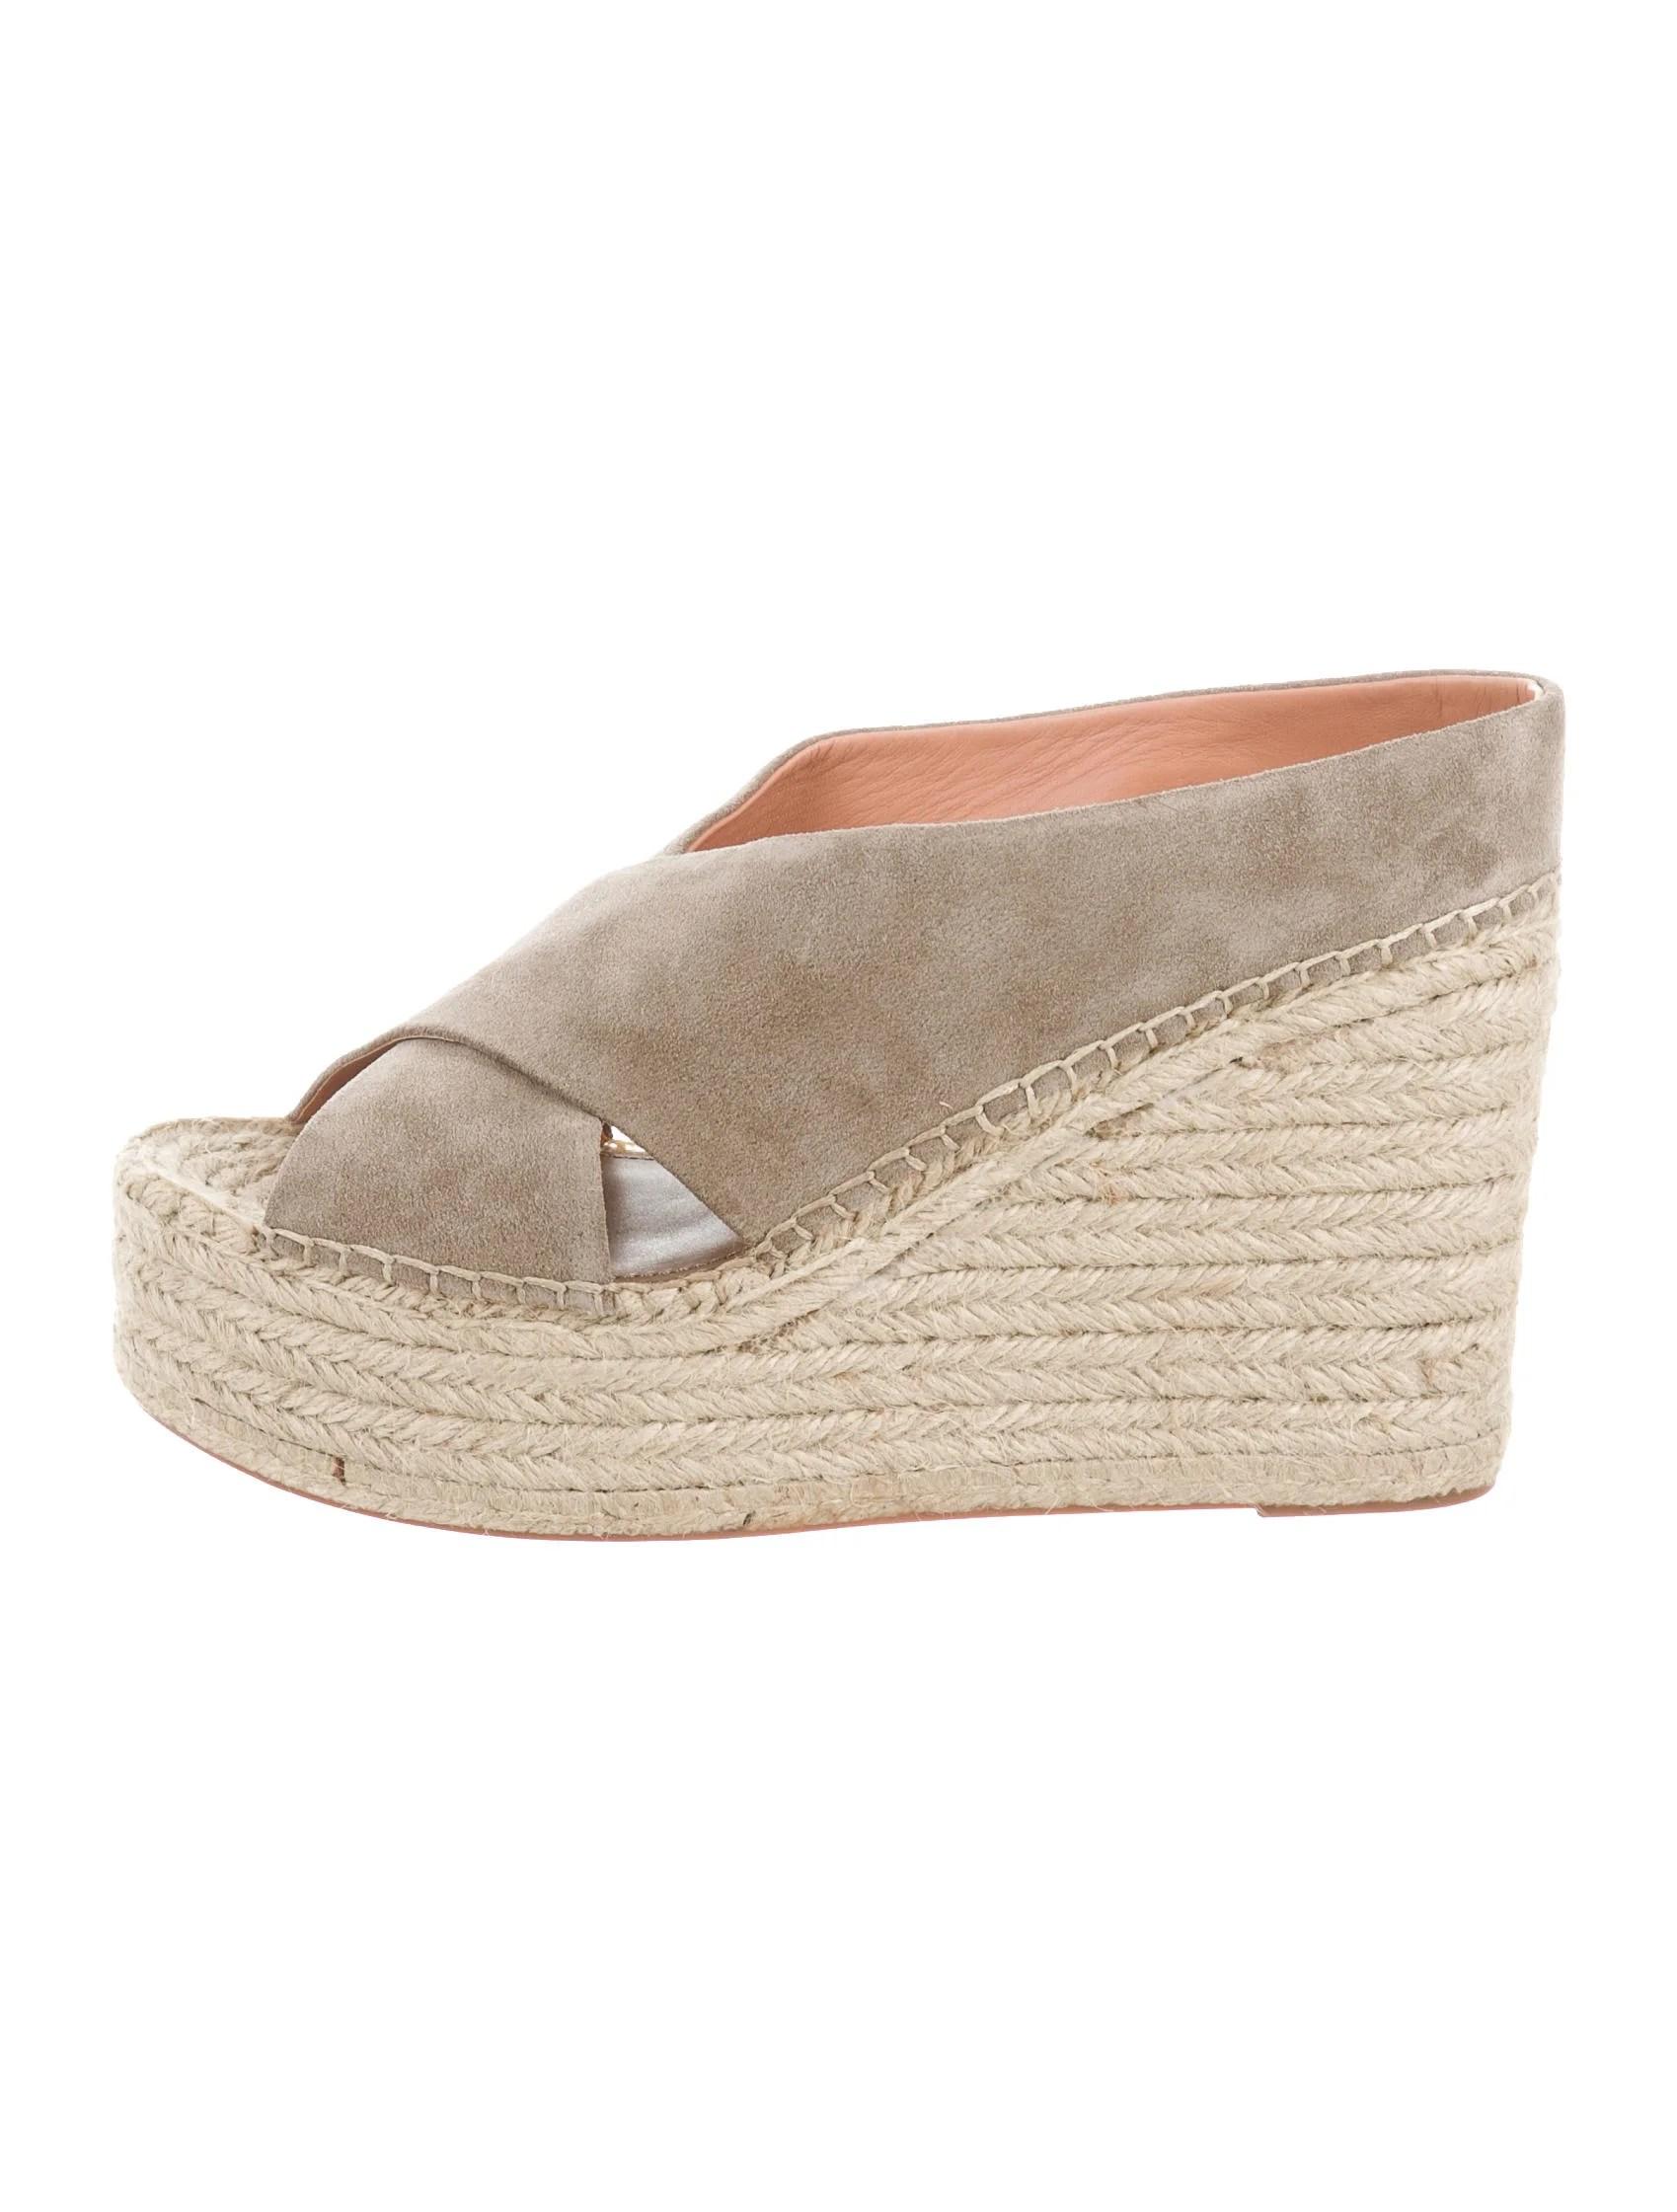 Sigerson Morrison Espadrille Wedge Sandals Shoes